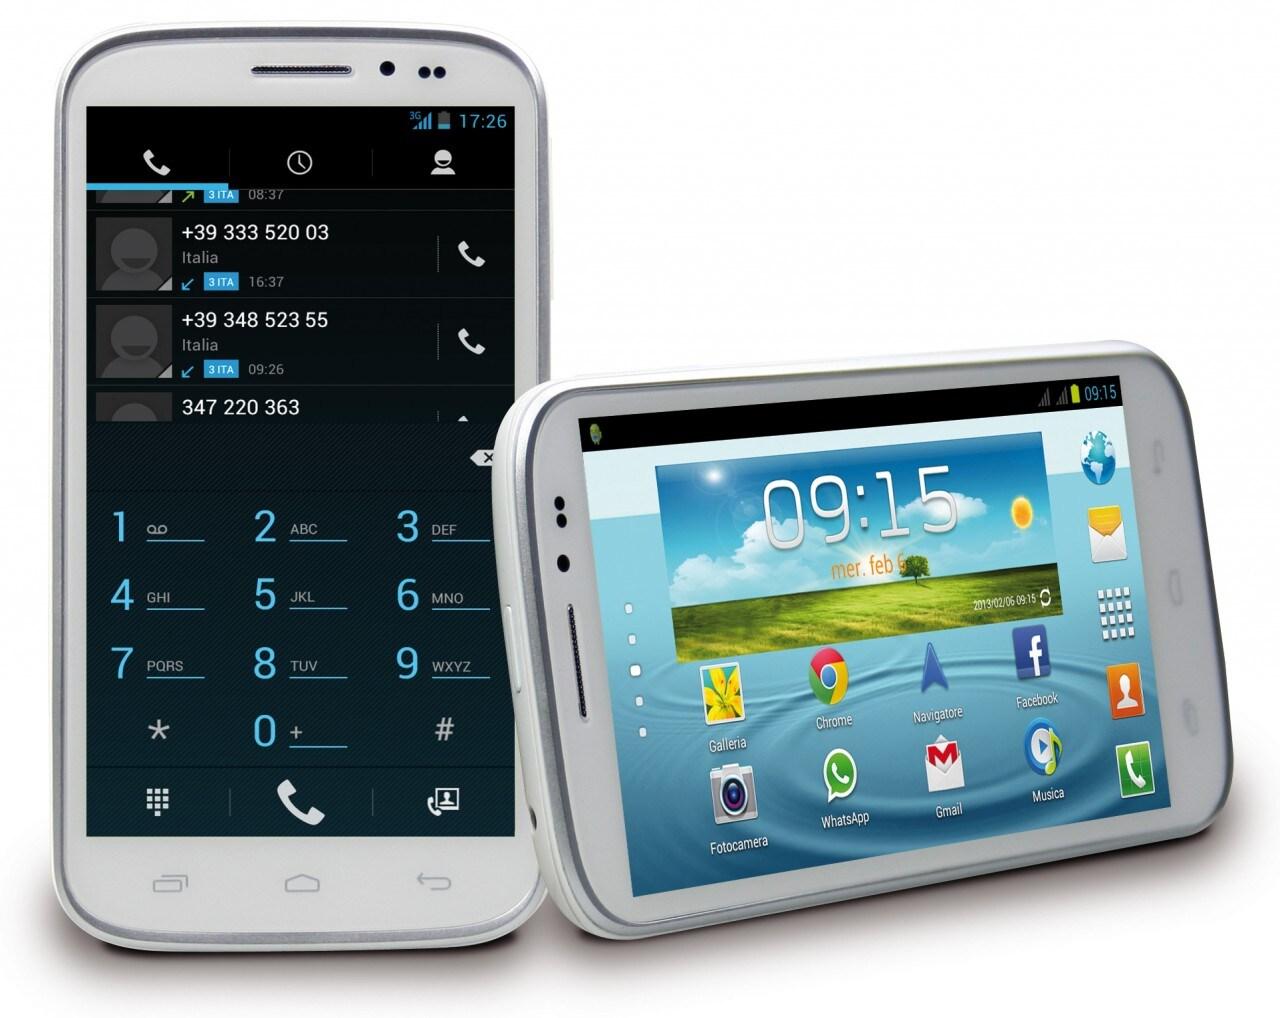 mediacom smart pad mini (6)